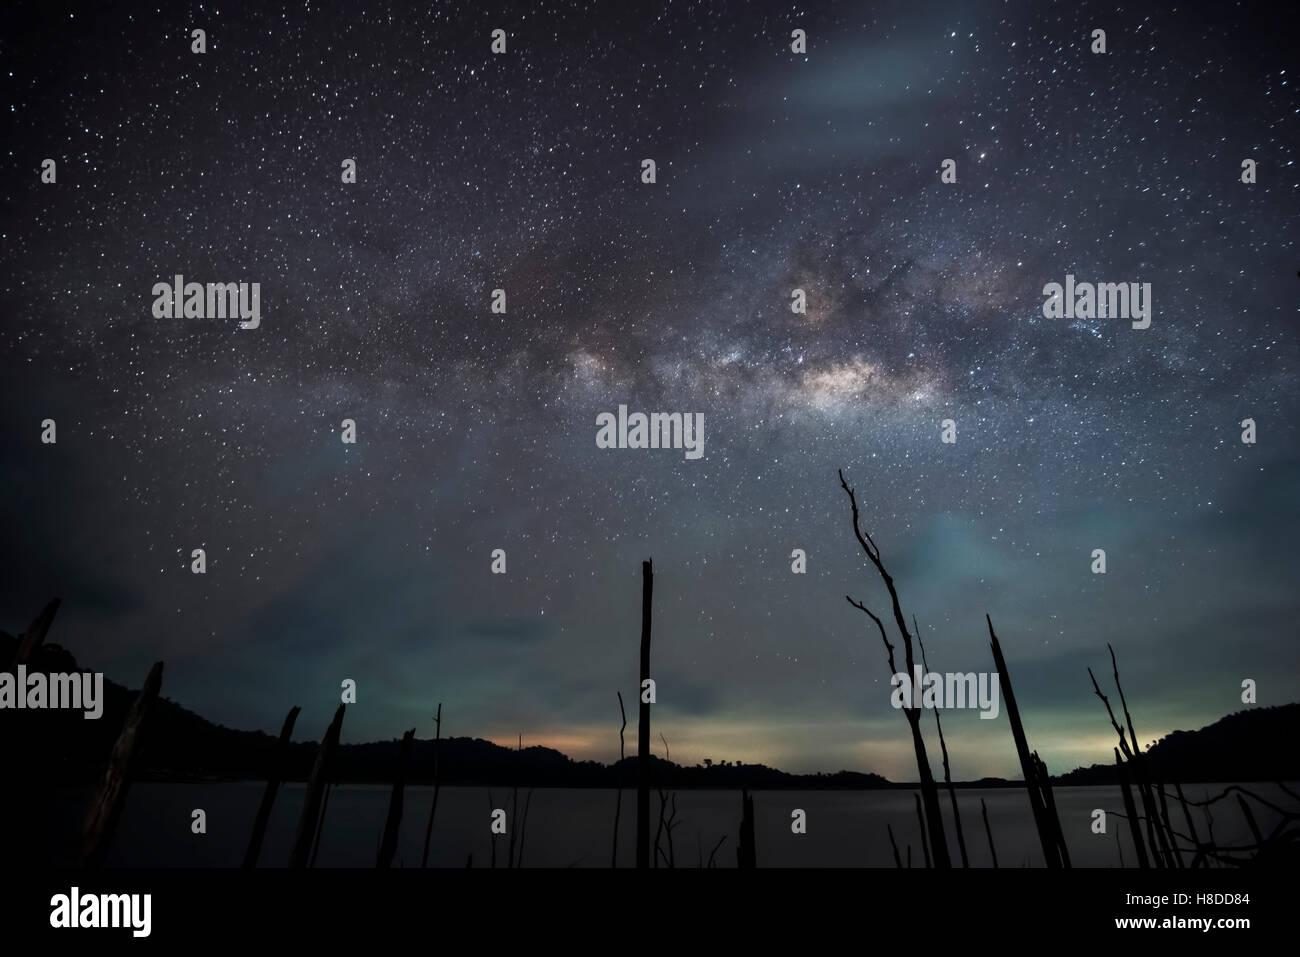 Milky way over dead tree - Stock Image